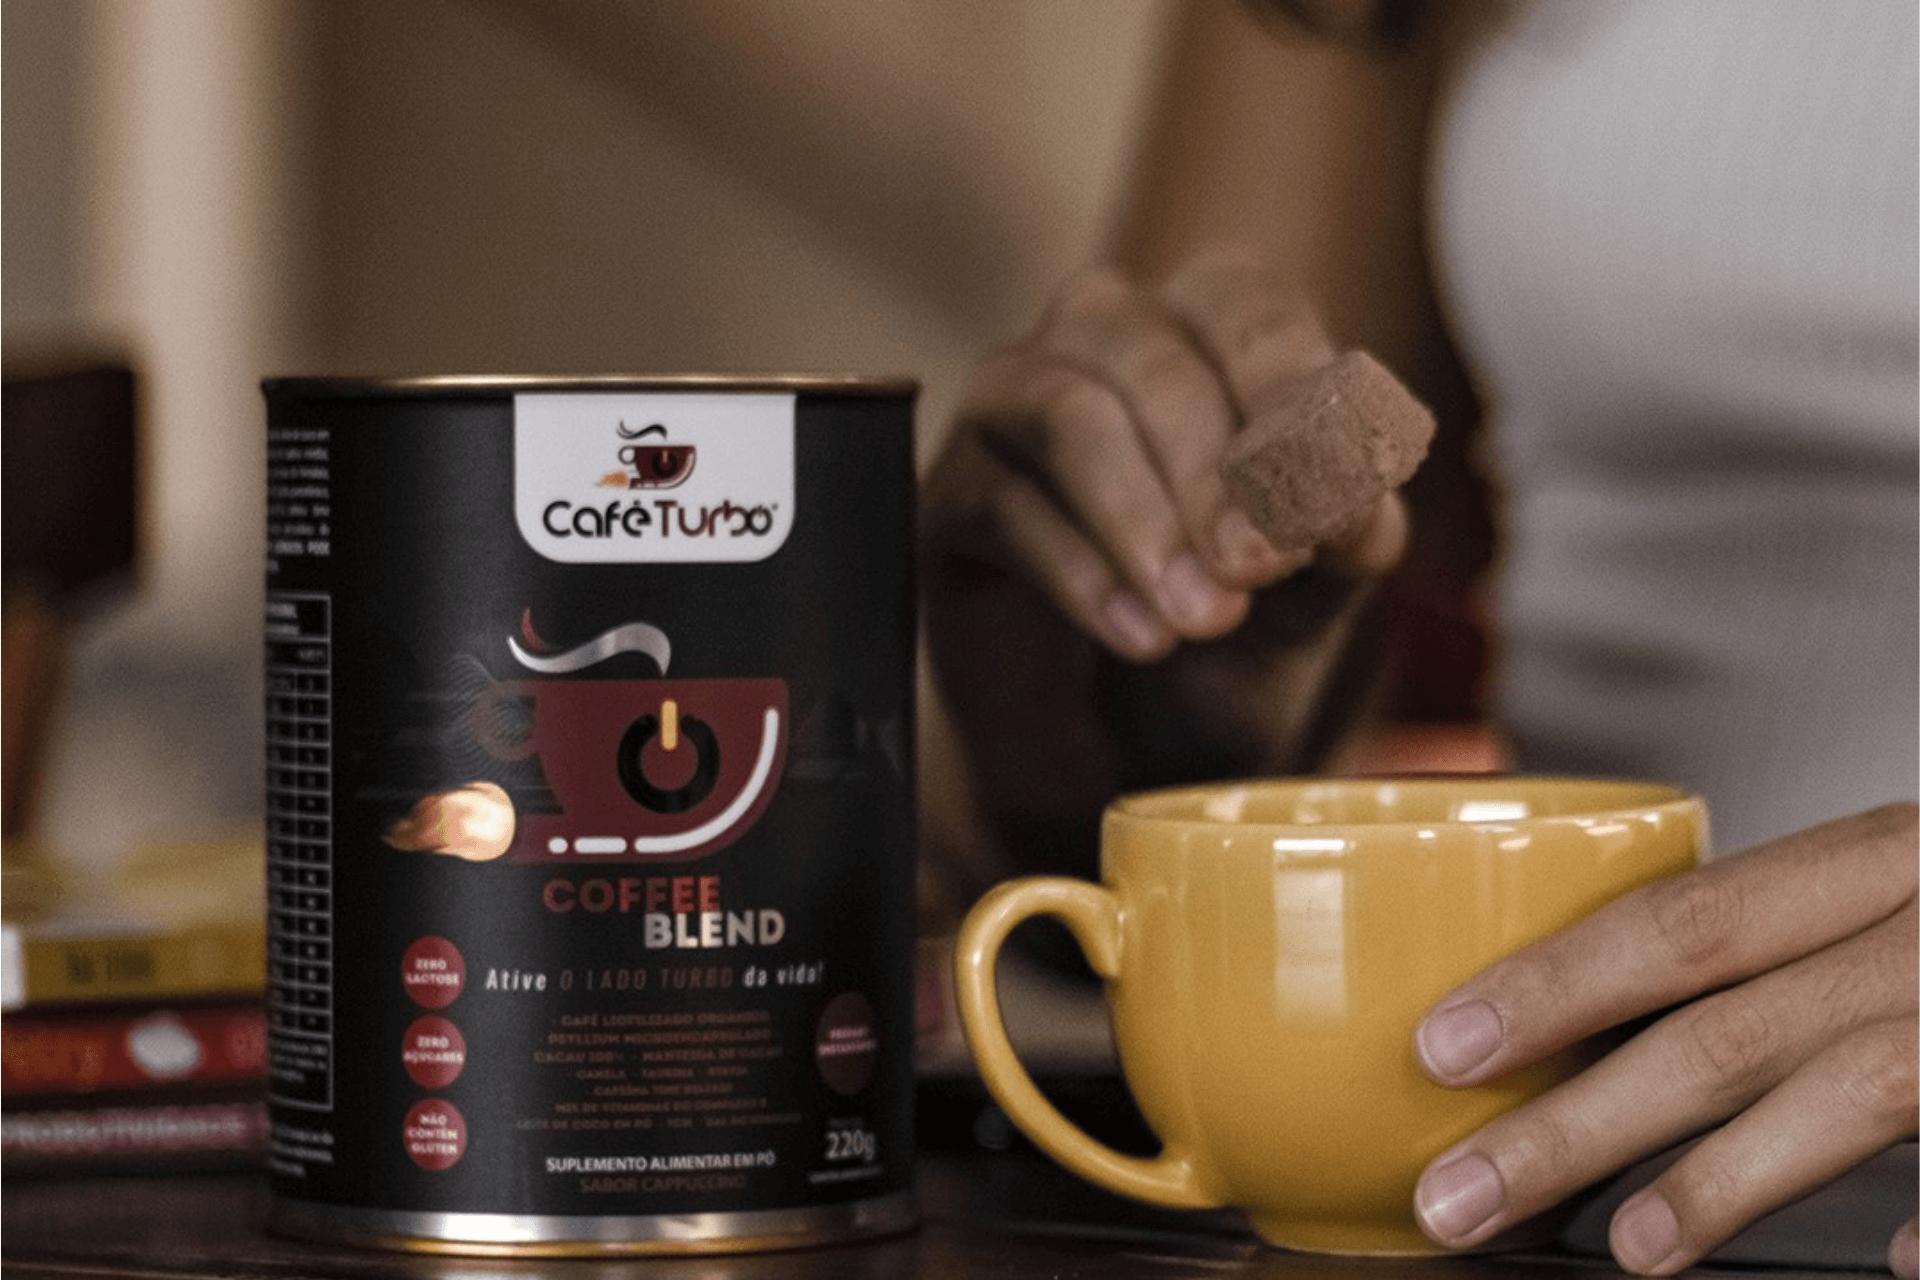 Café Turbo - A Chave para a vida turbo